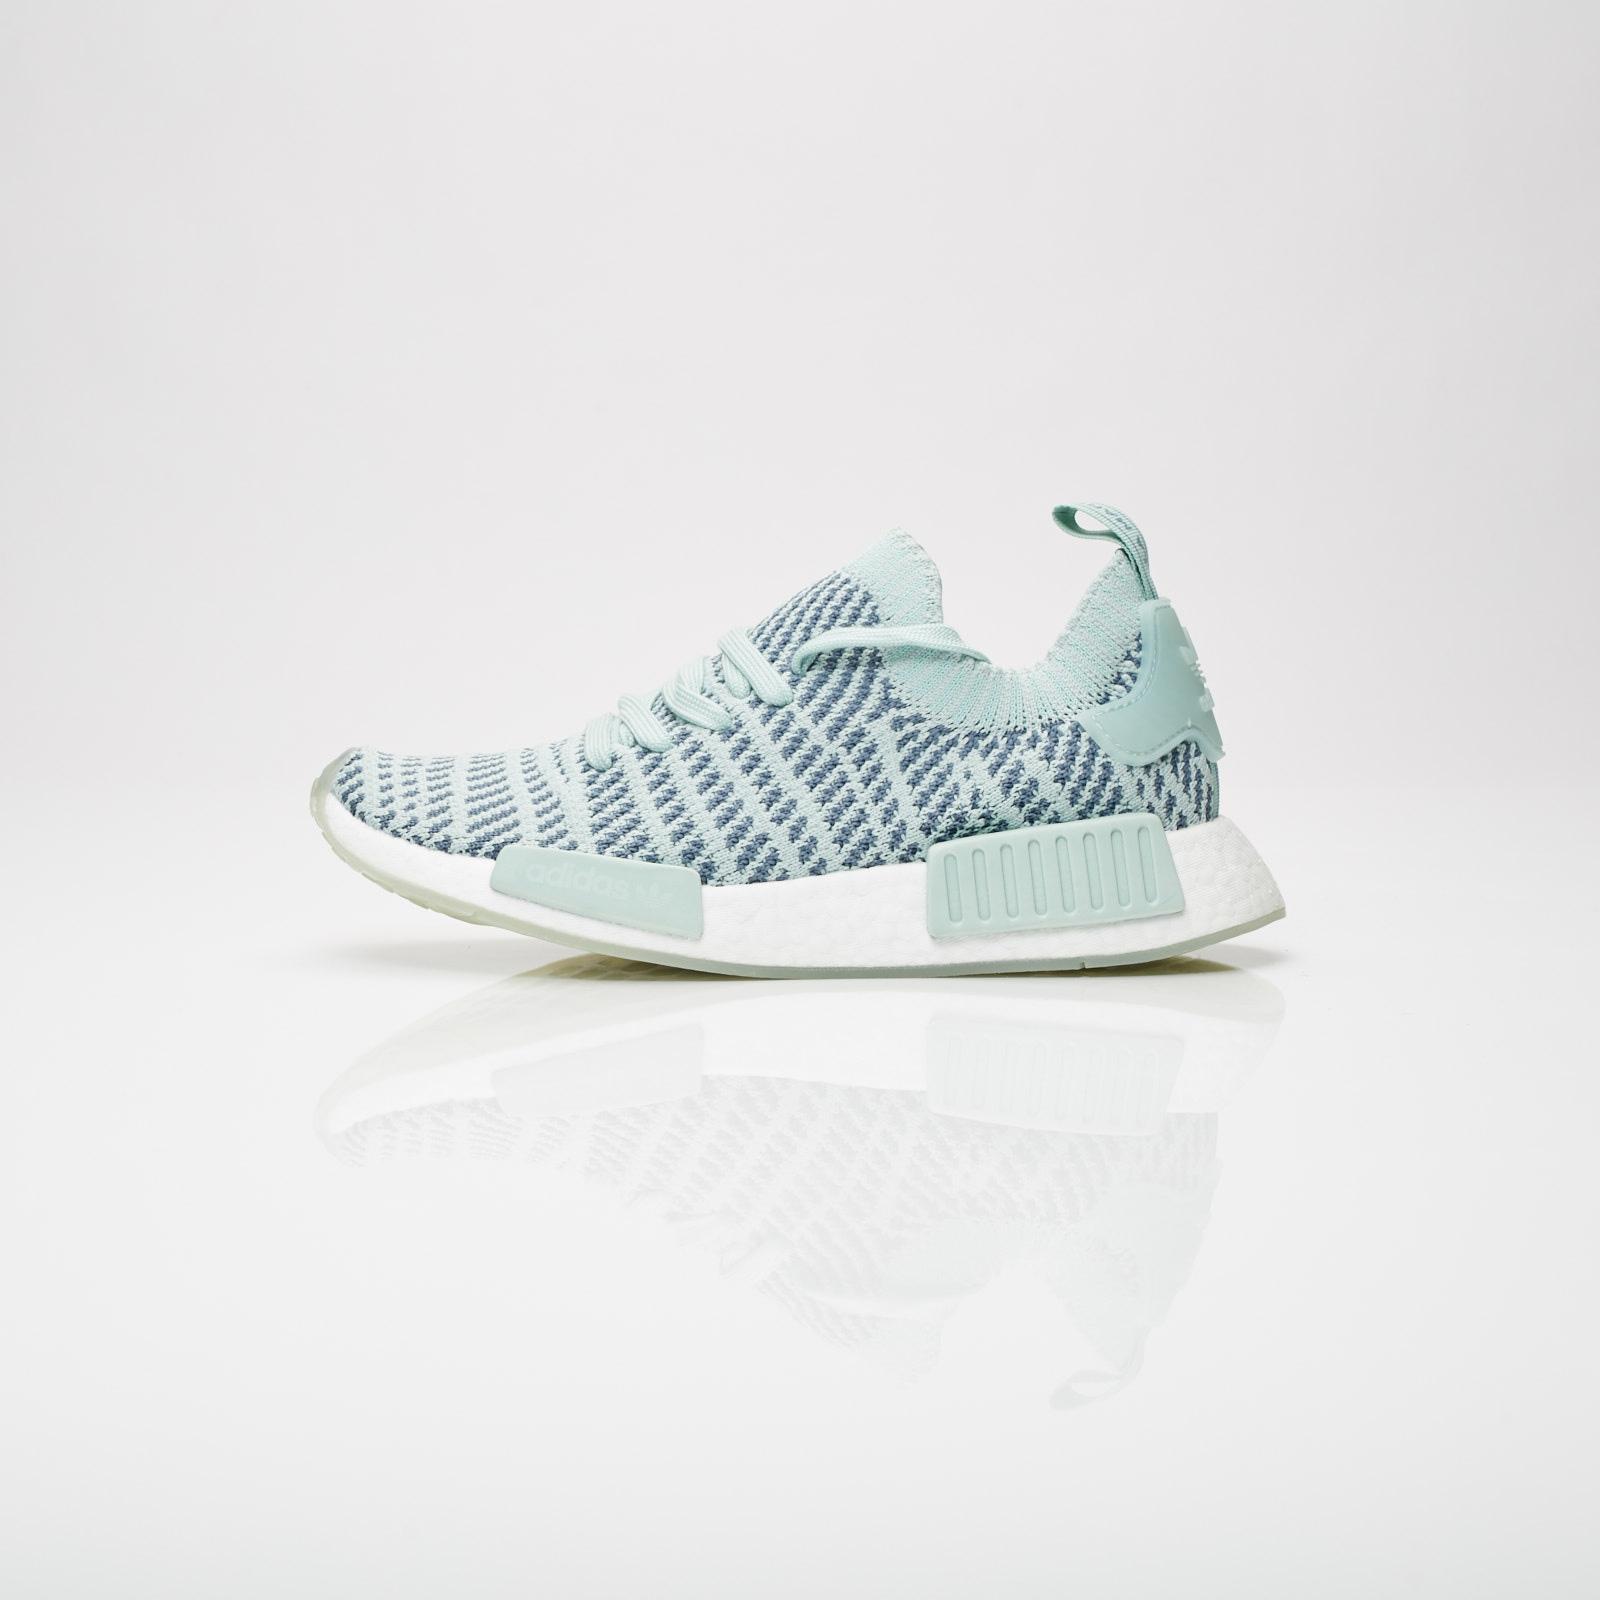 quality design 36965 026b3 adidas NMD R1 Stlt PK W - Cq2031 - Sneakersnstuff   sneakers ...